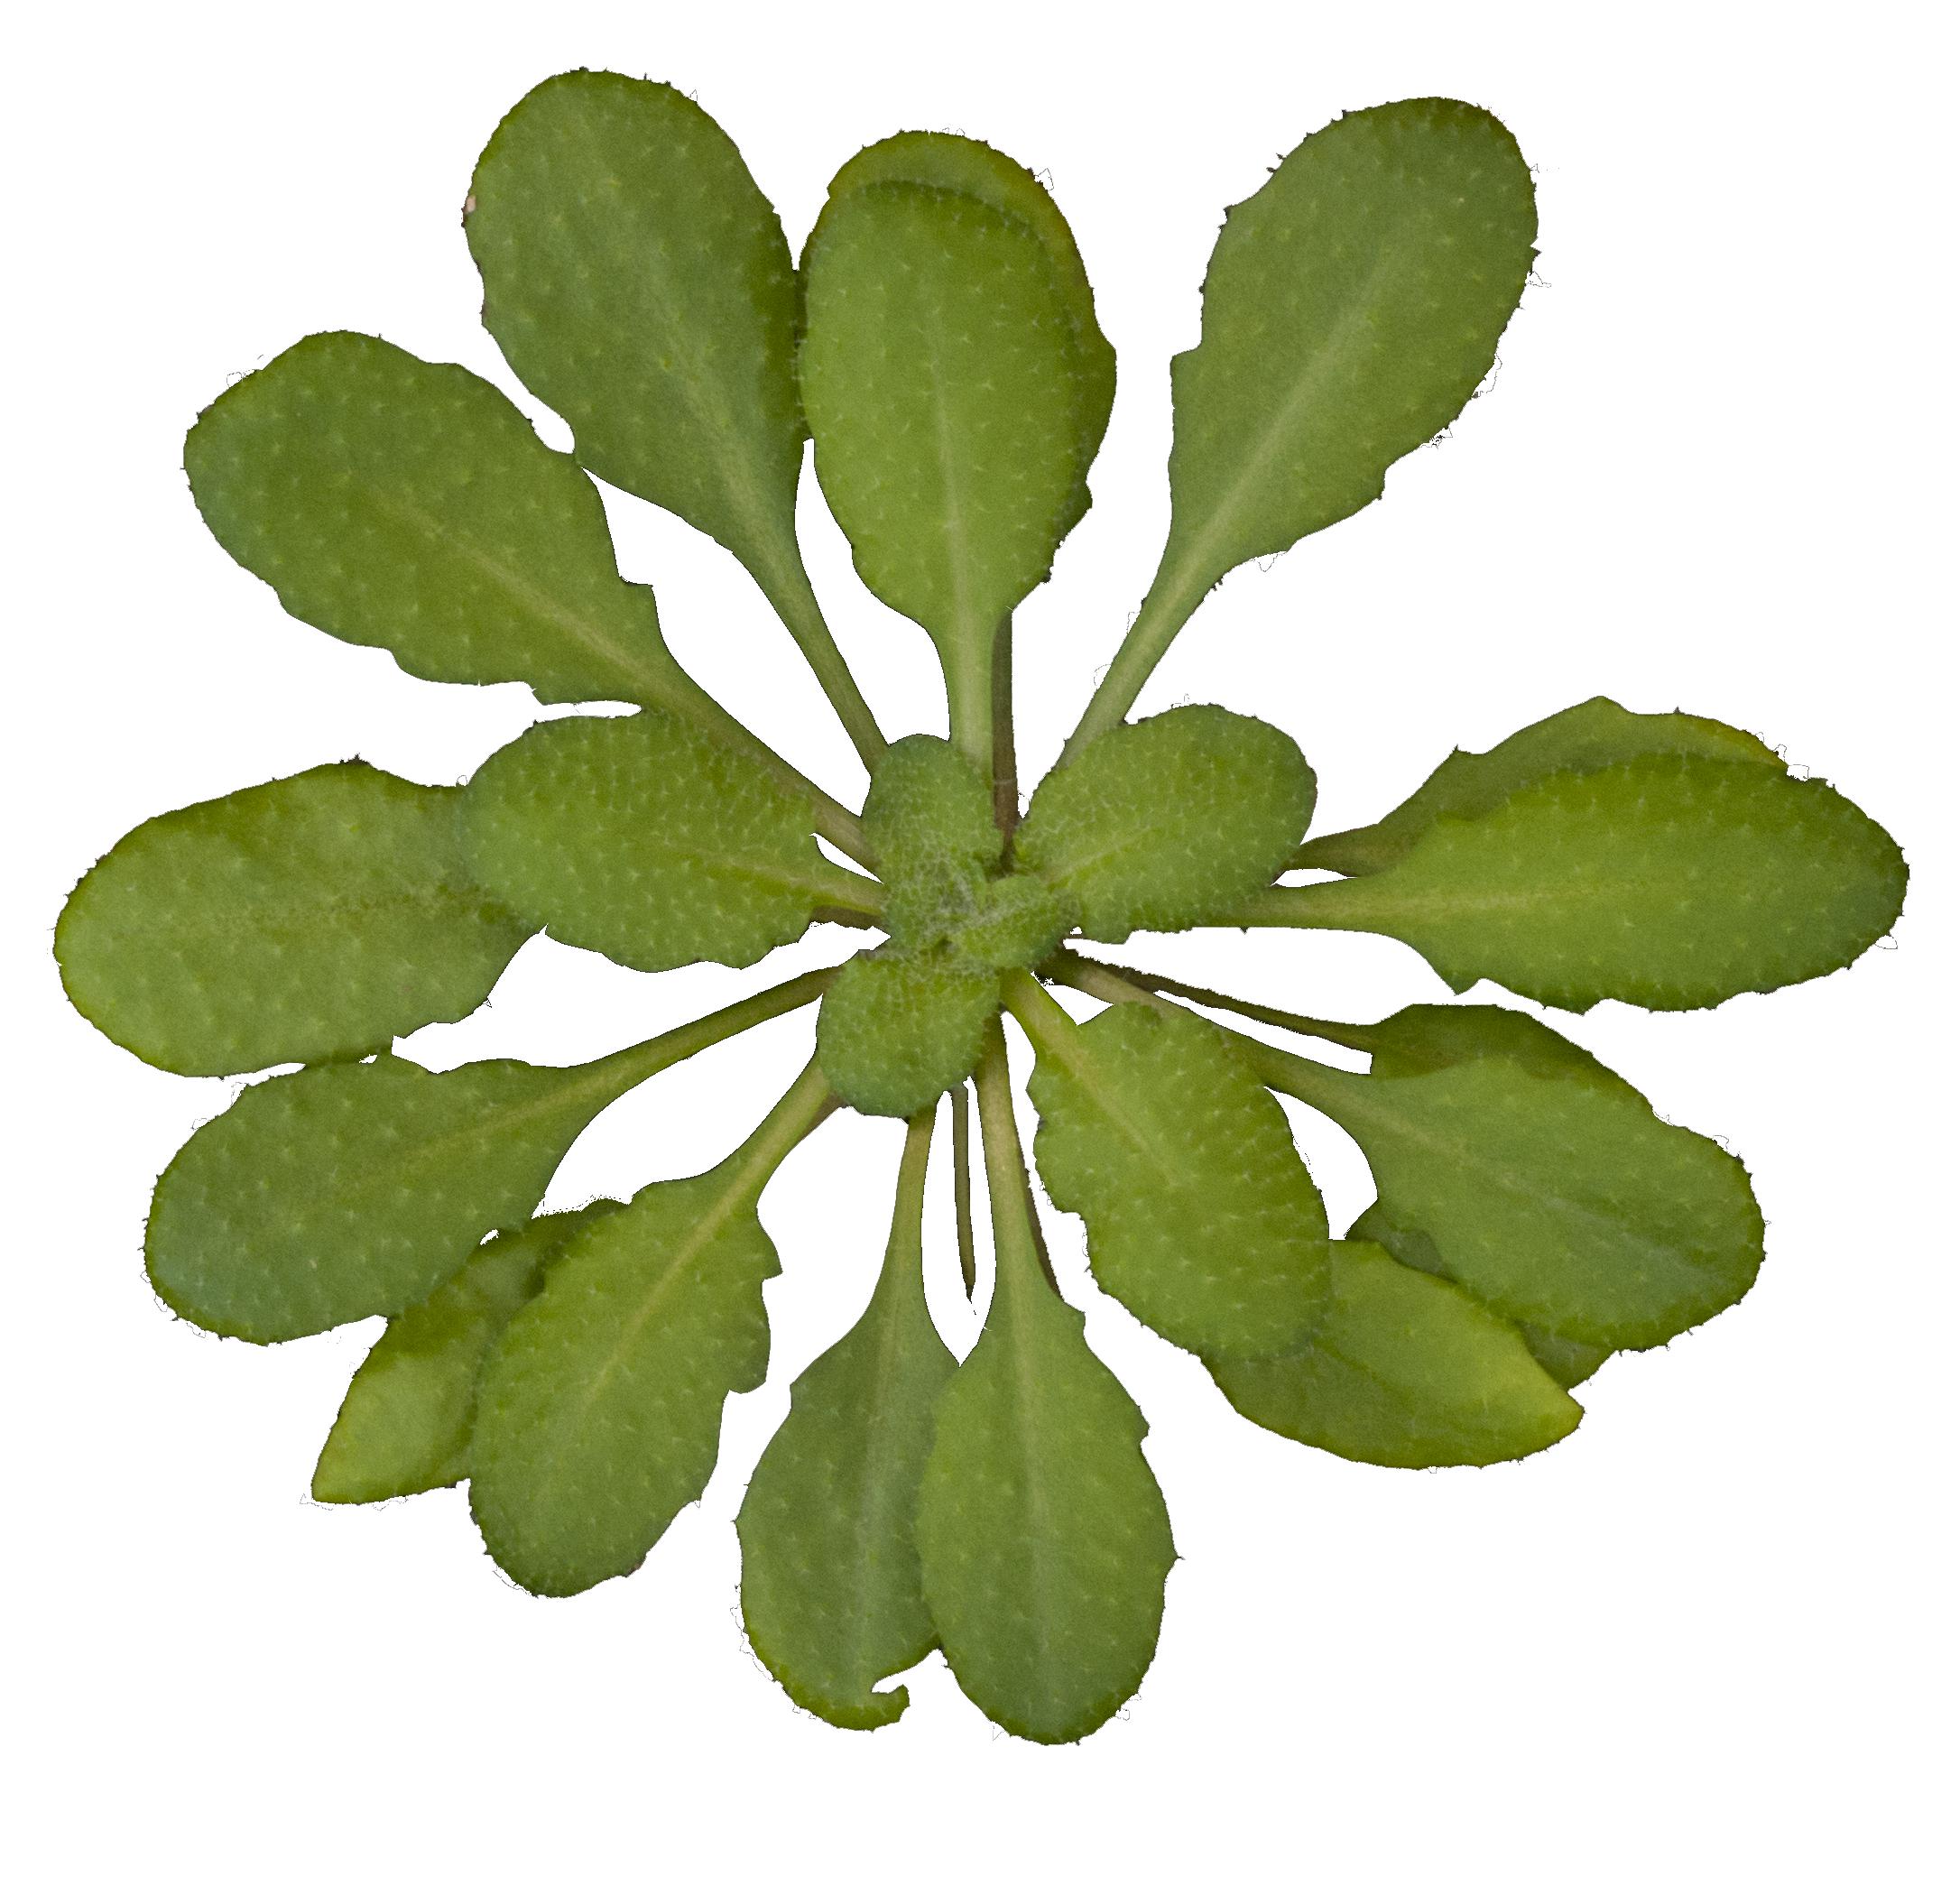 file arabidopsis thaliana rosette transparent wikimedia commons. Black Bedroom Furniture Sets. Home Design Ideas